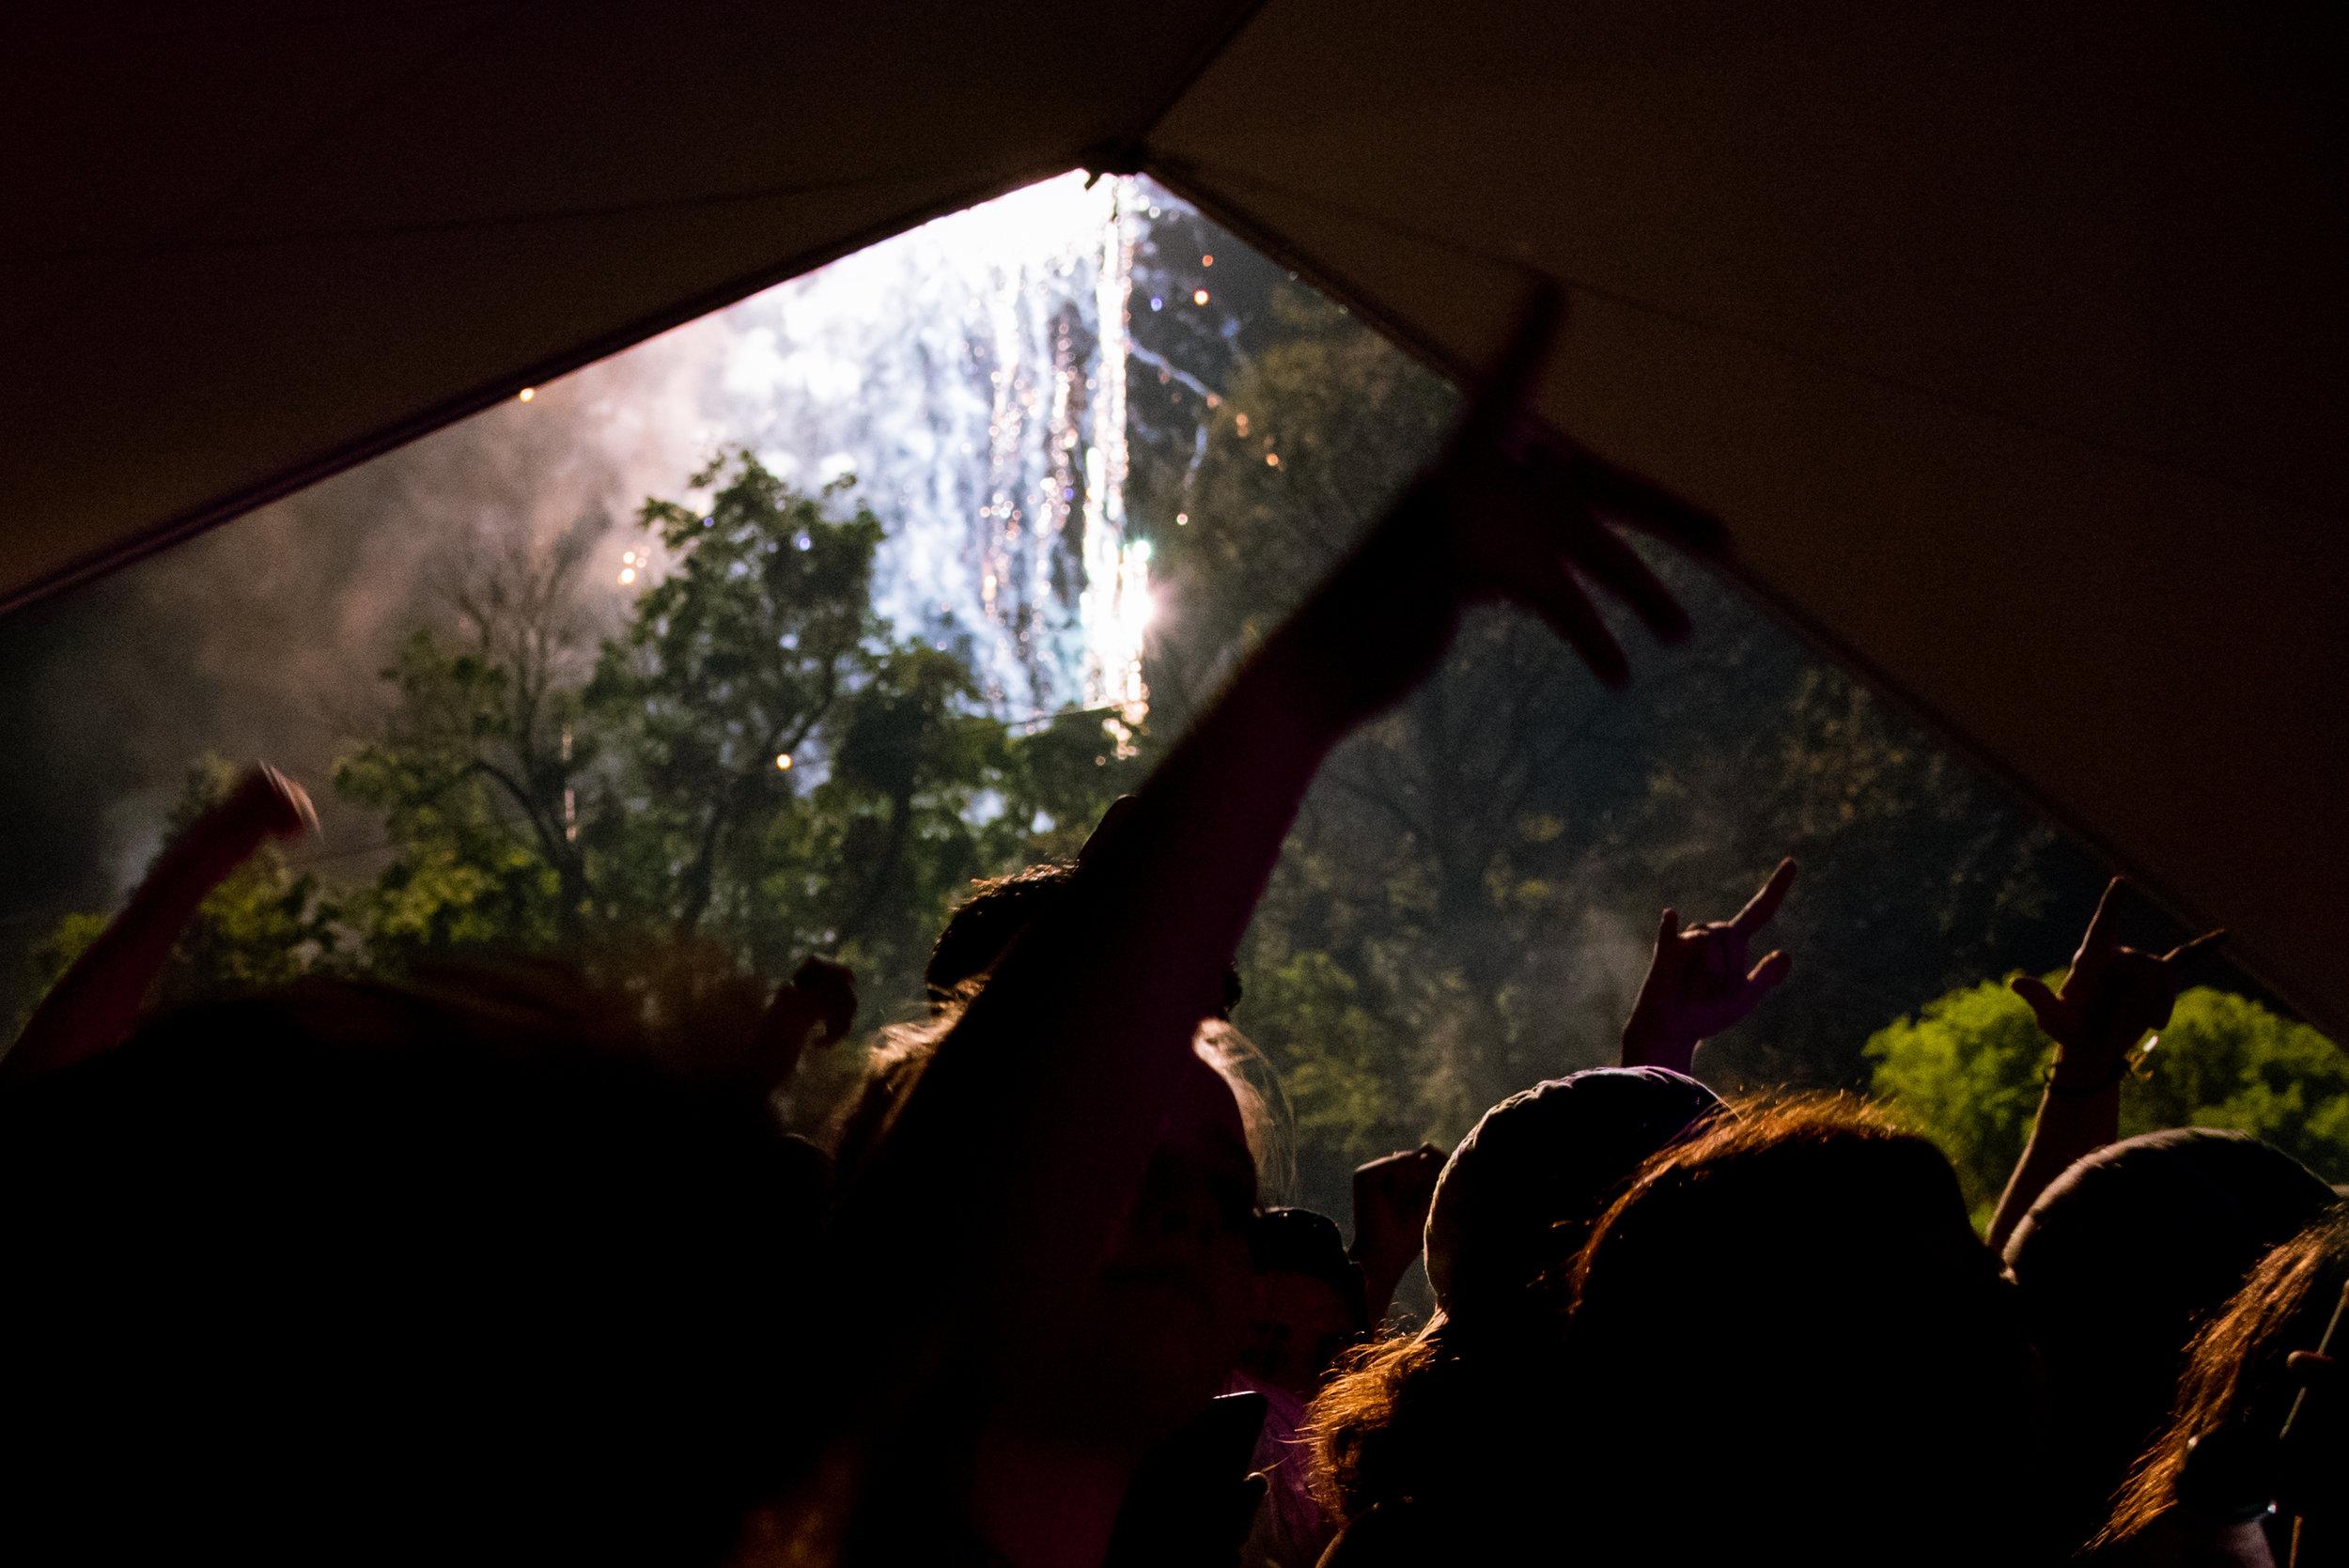 2018.7.7.nwg.sitp.edm.dance.fireworks.music-4.jpg